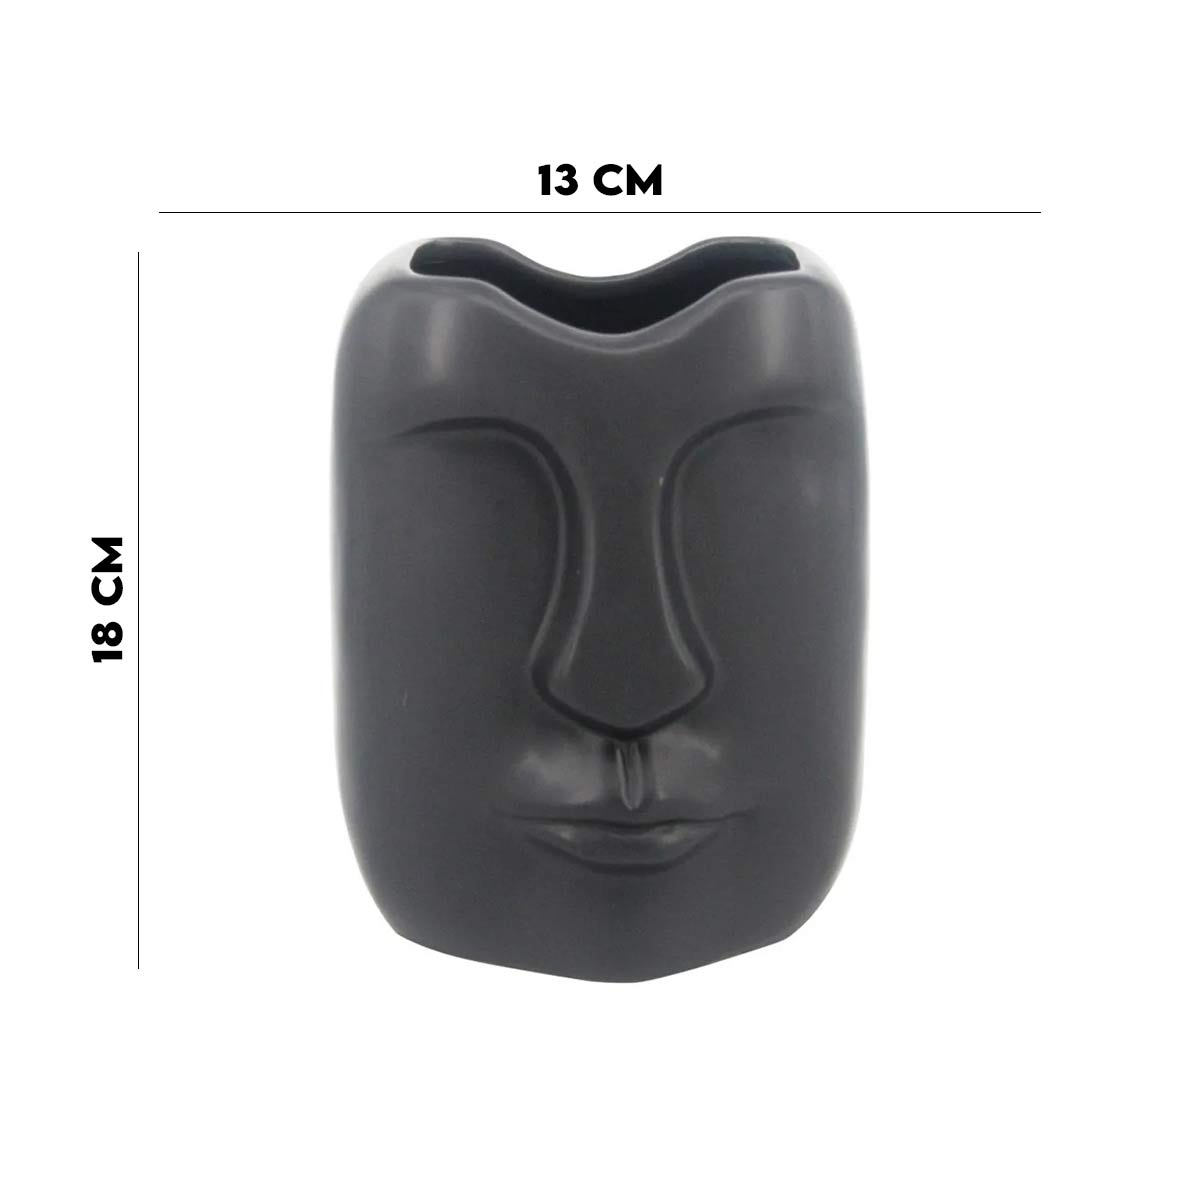 Vaso de Cerâmica com Formato de Rosto Preto  - Lemis